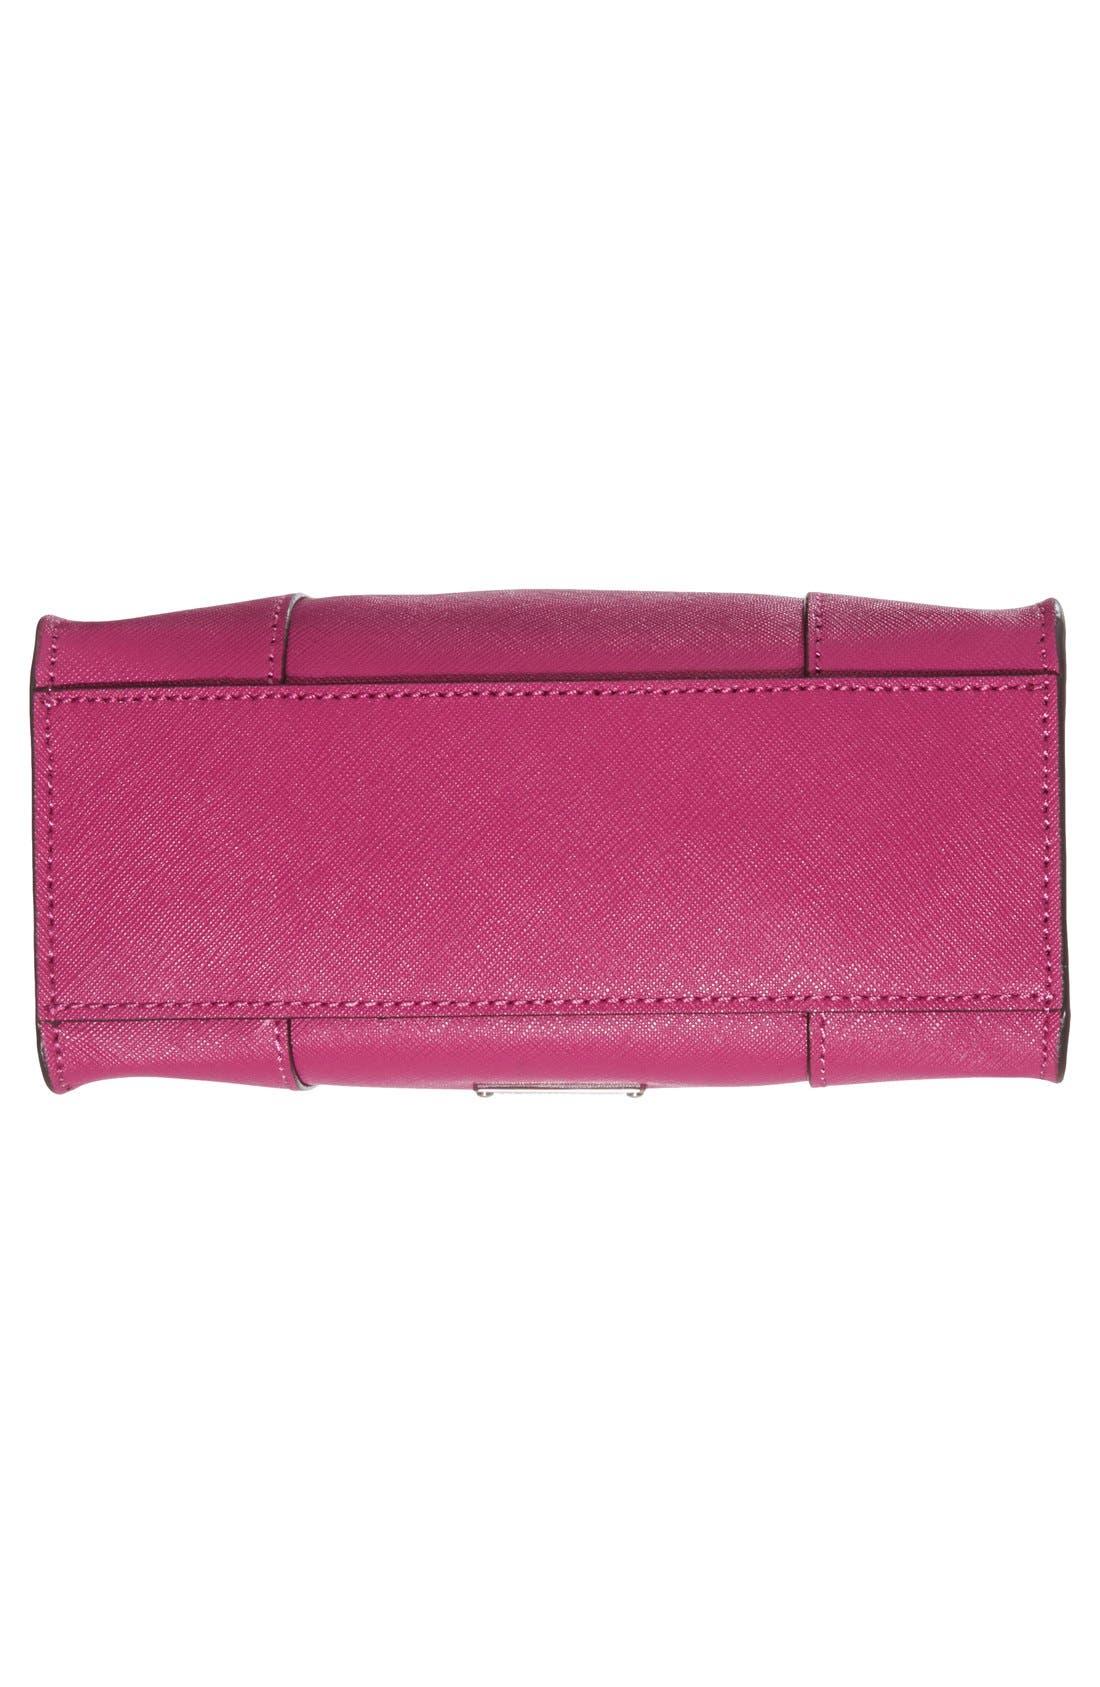 ,                             'Mini MAB Tote' Crossbody Bag,                             Alternate thumbnail 117, color,                             655